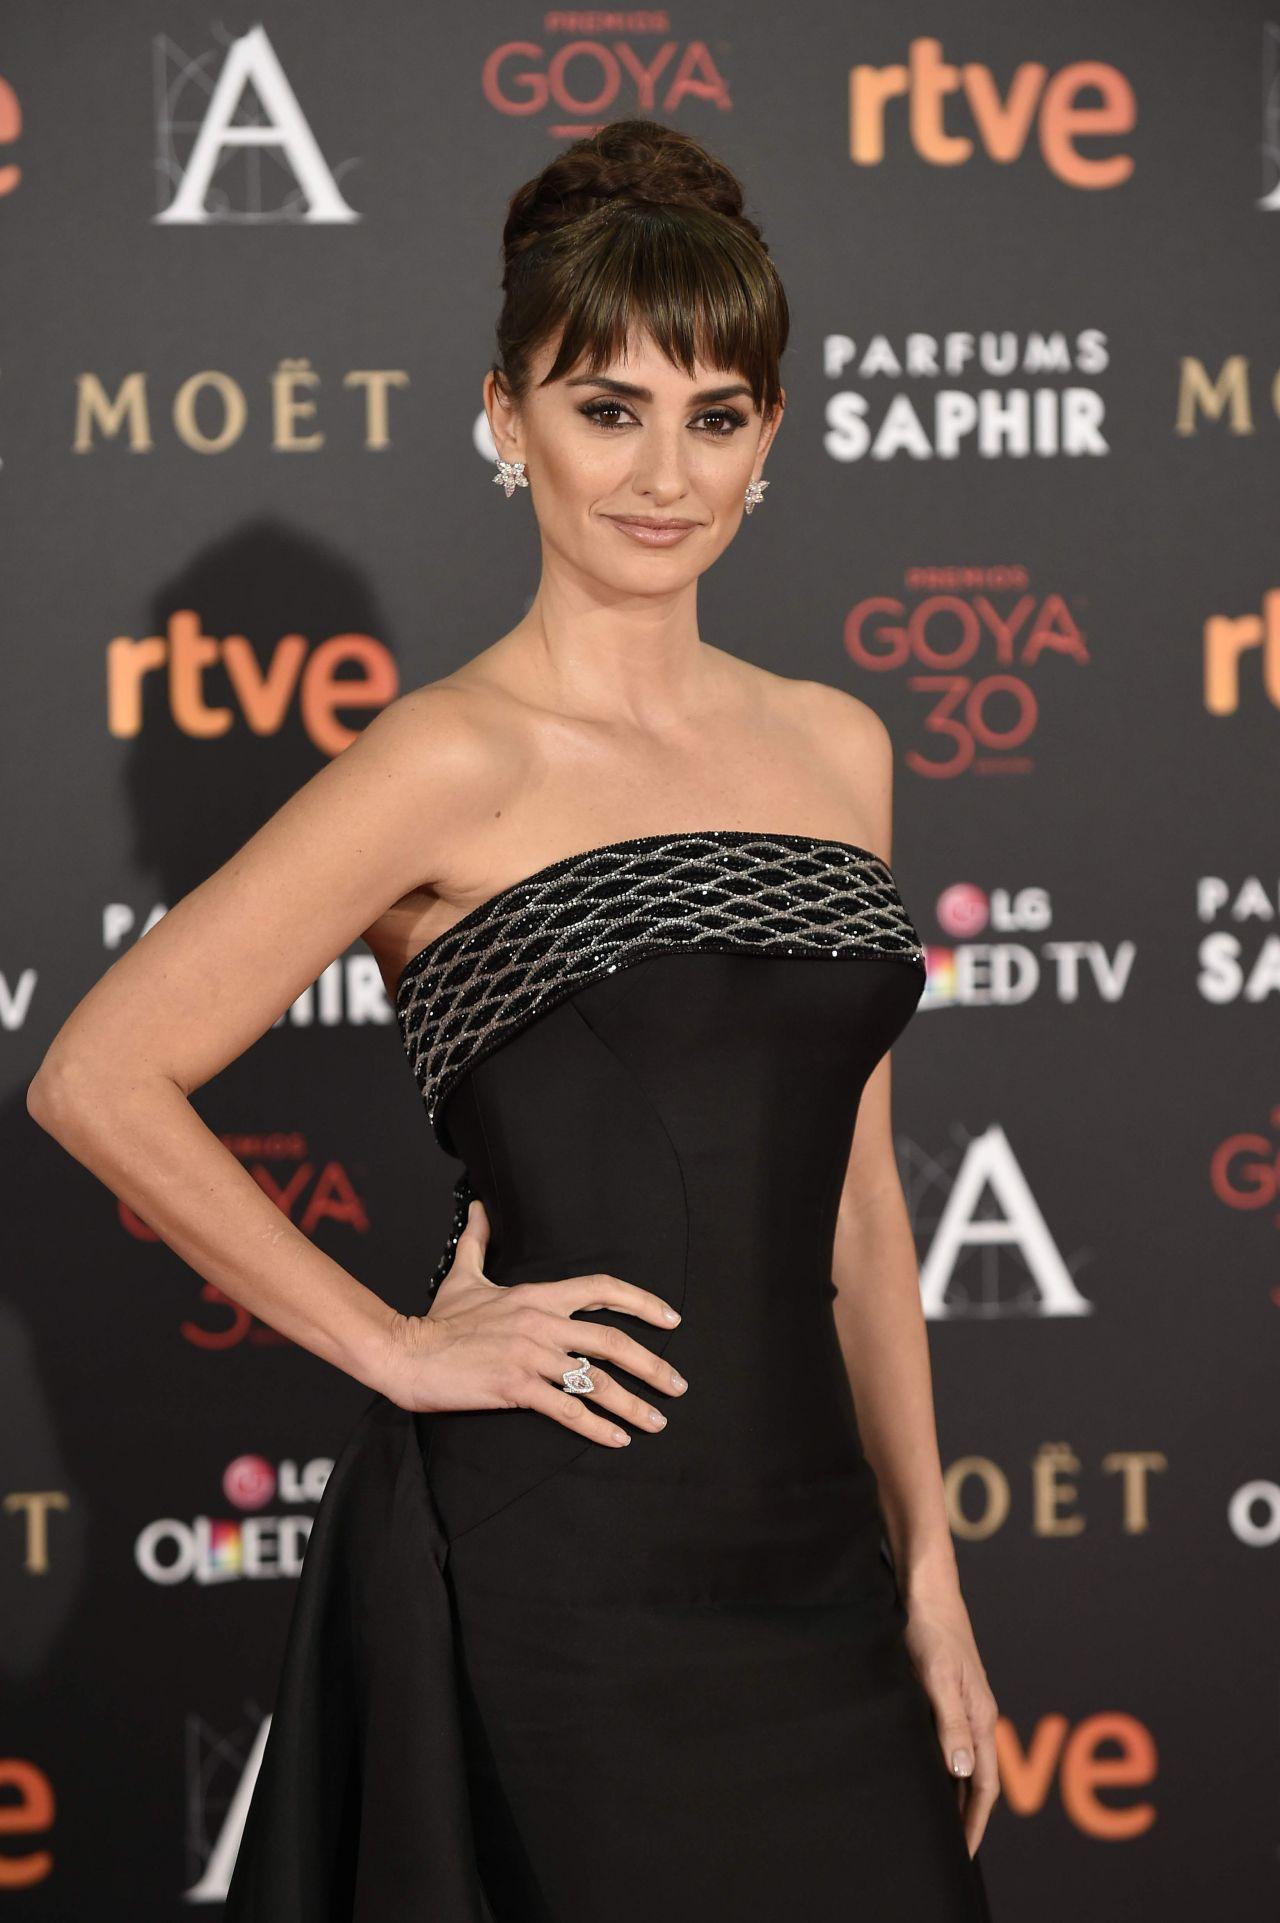 Penelope Cruz – 2016 Goya Film Awards in Madrid Penelope Cruz